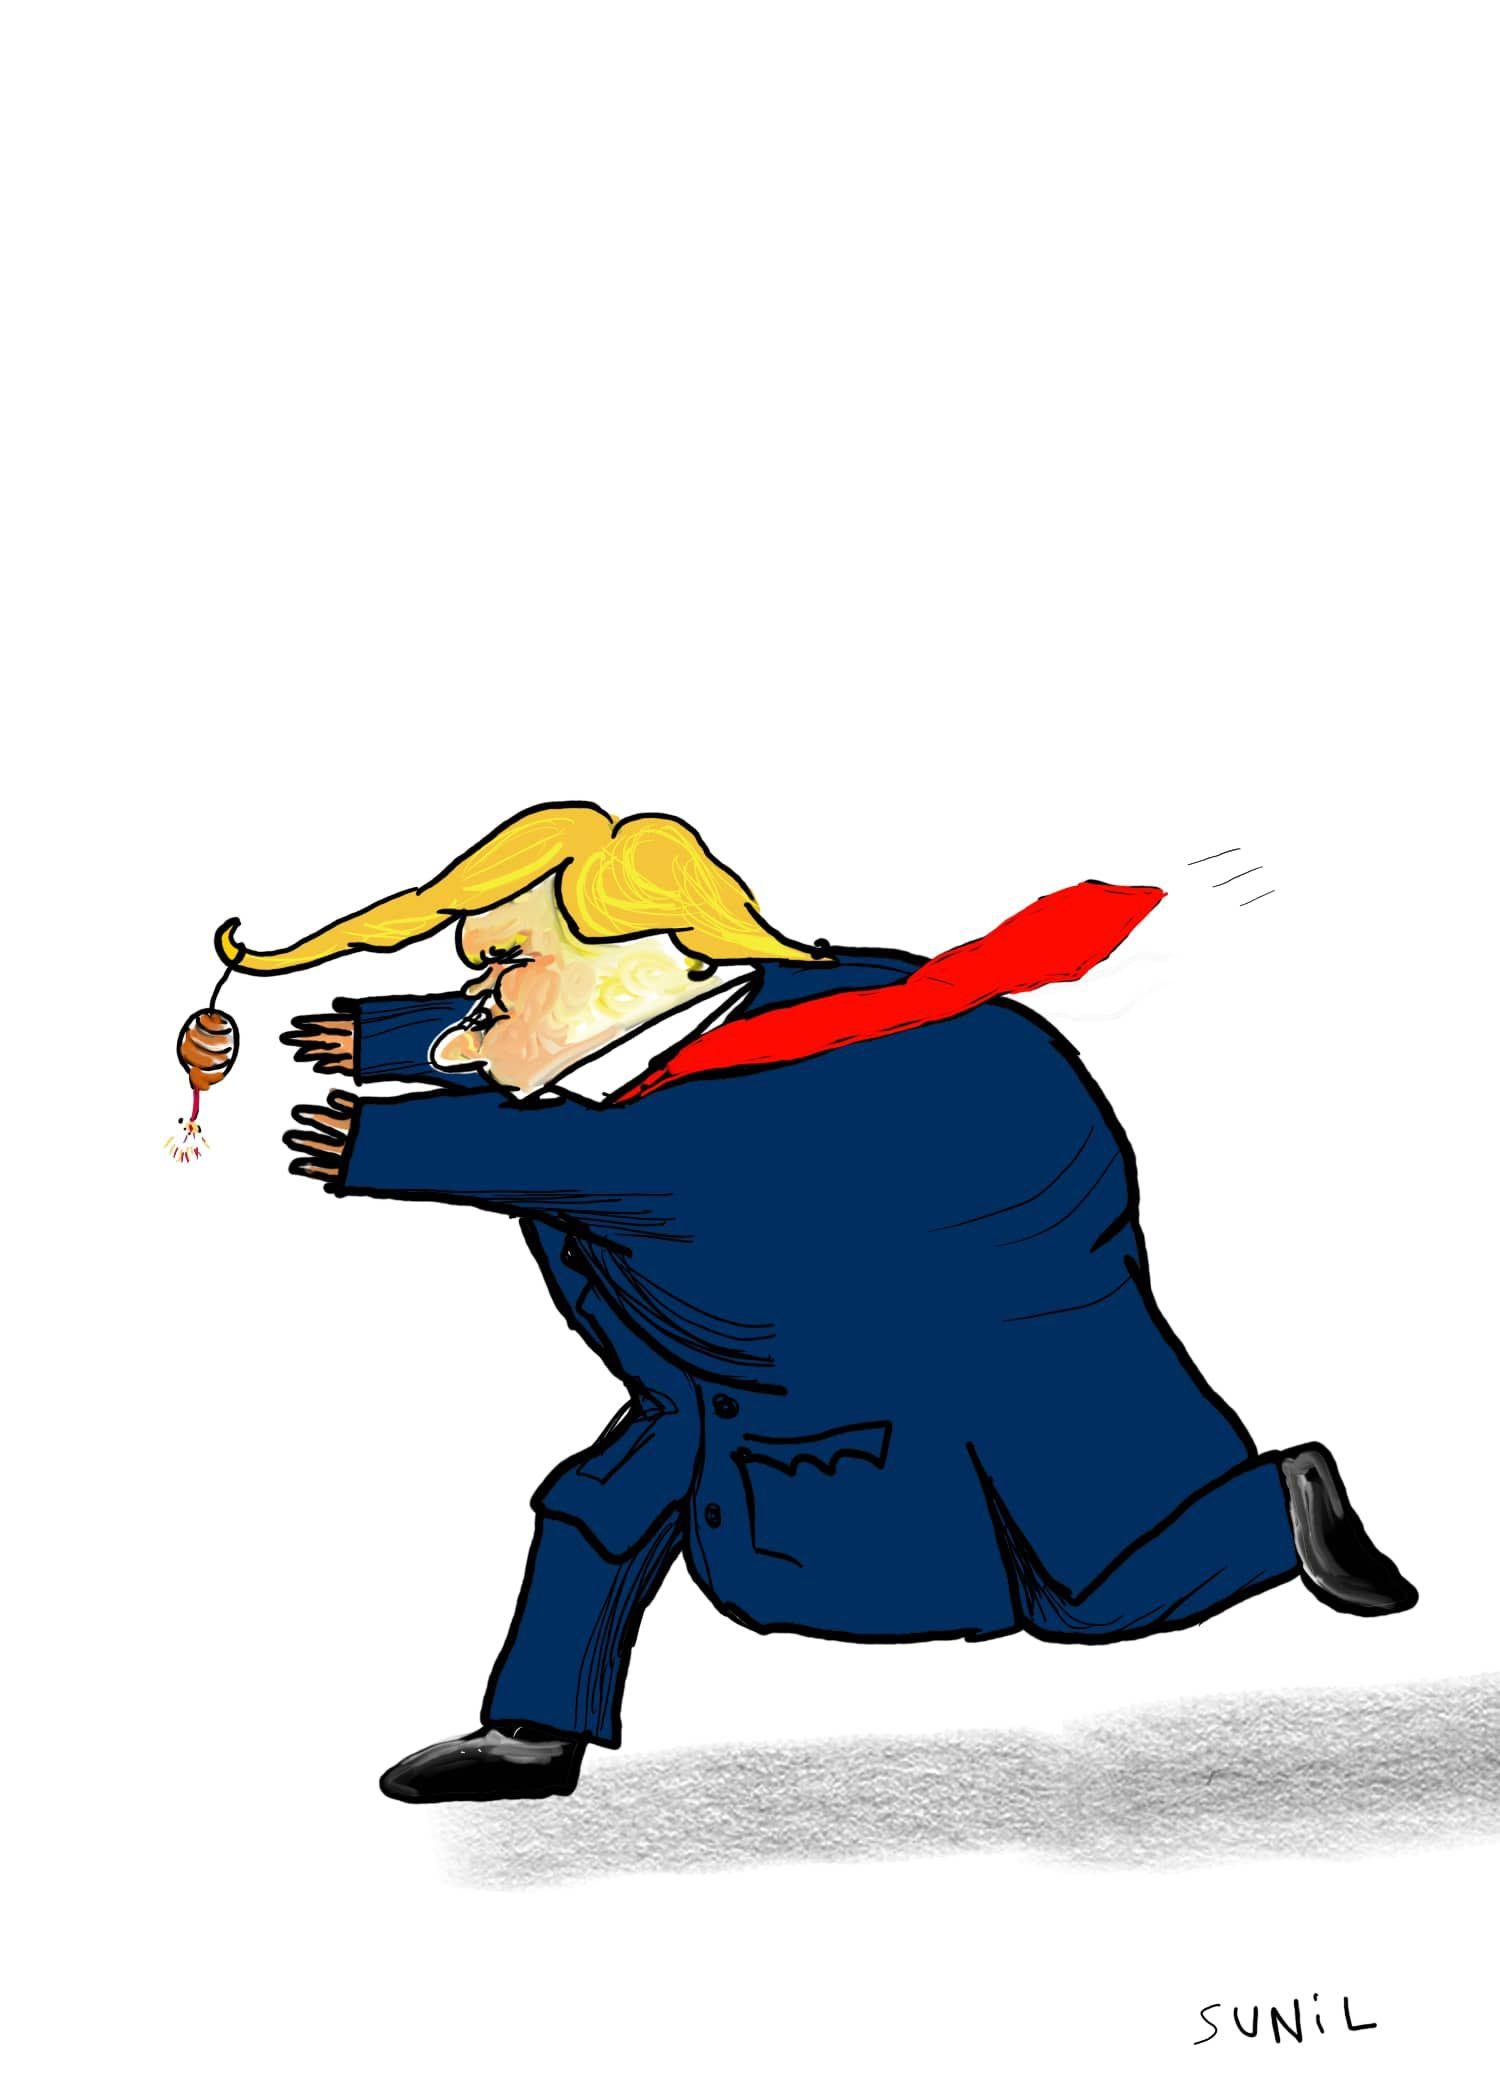 Trumpeach